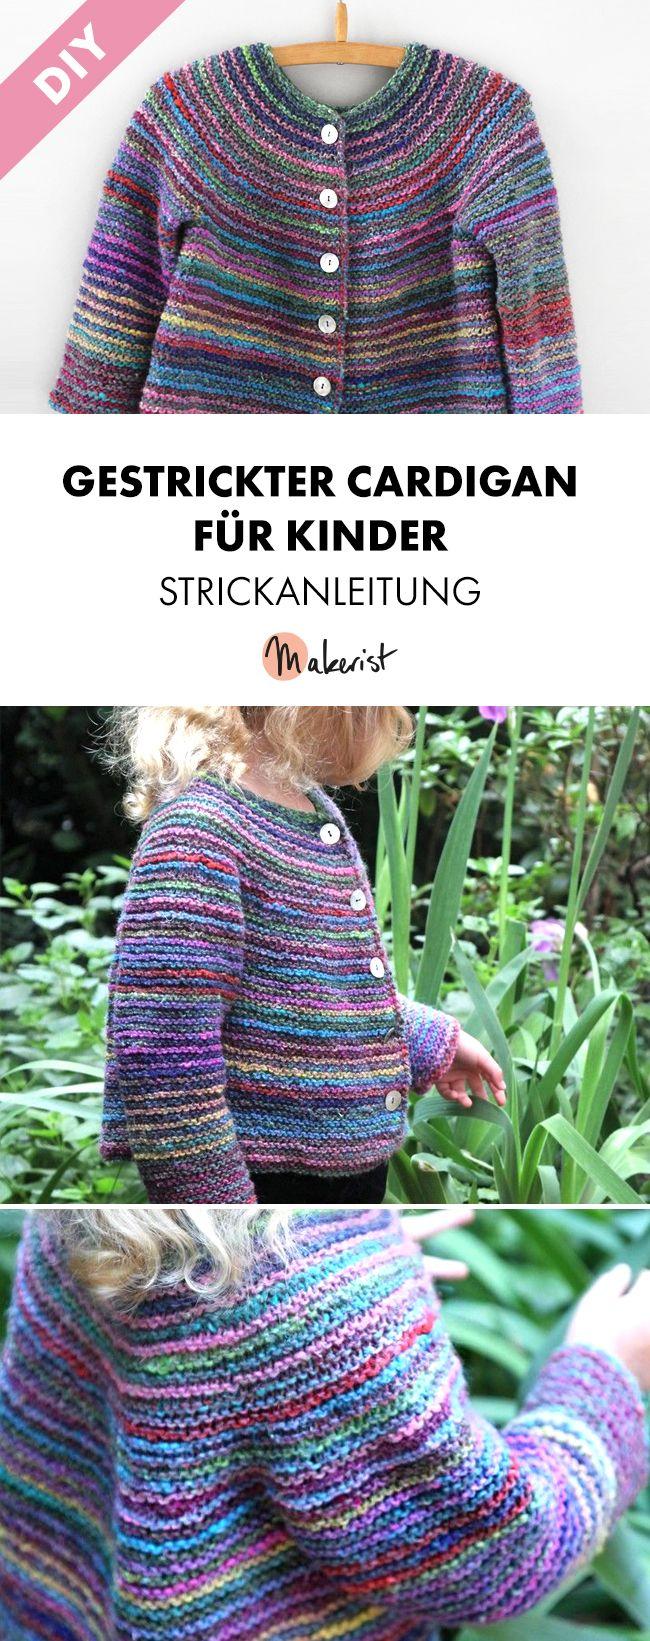 Photo of Gestrickter Cardigan für Kinder – Strickanleitung via Makerist.de